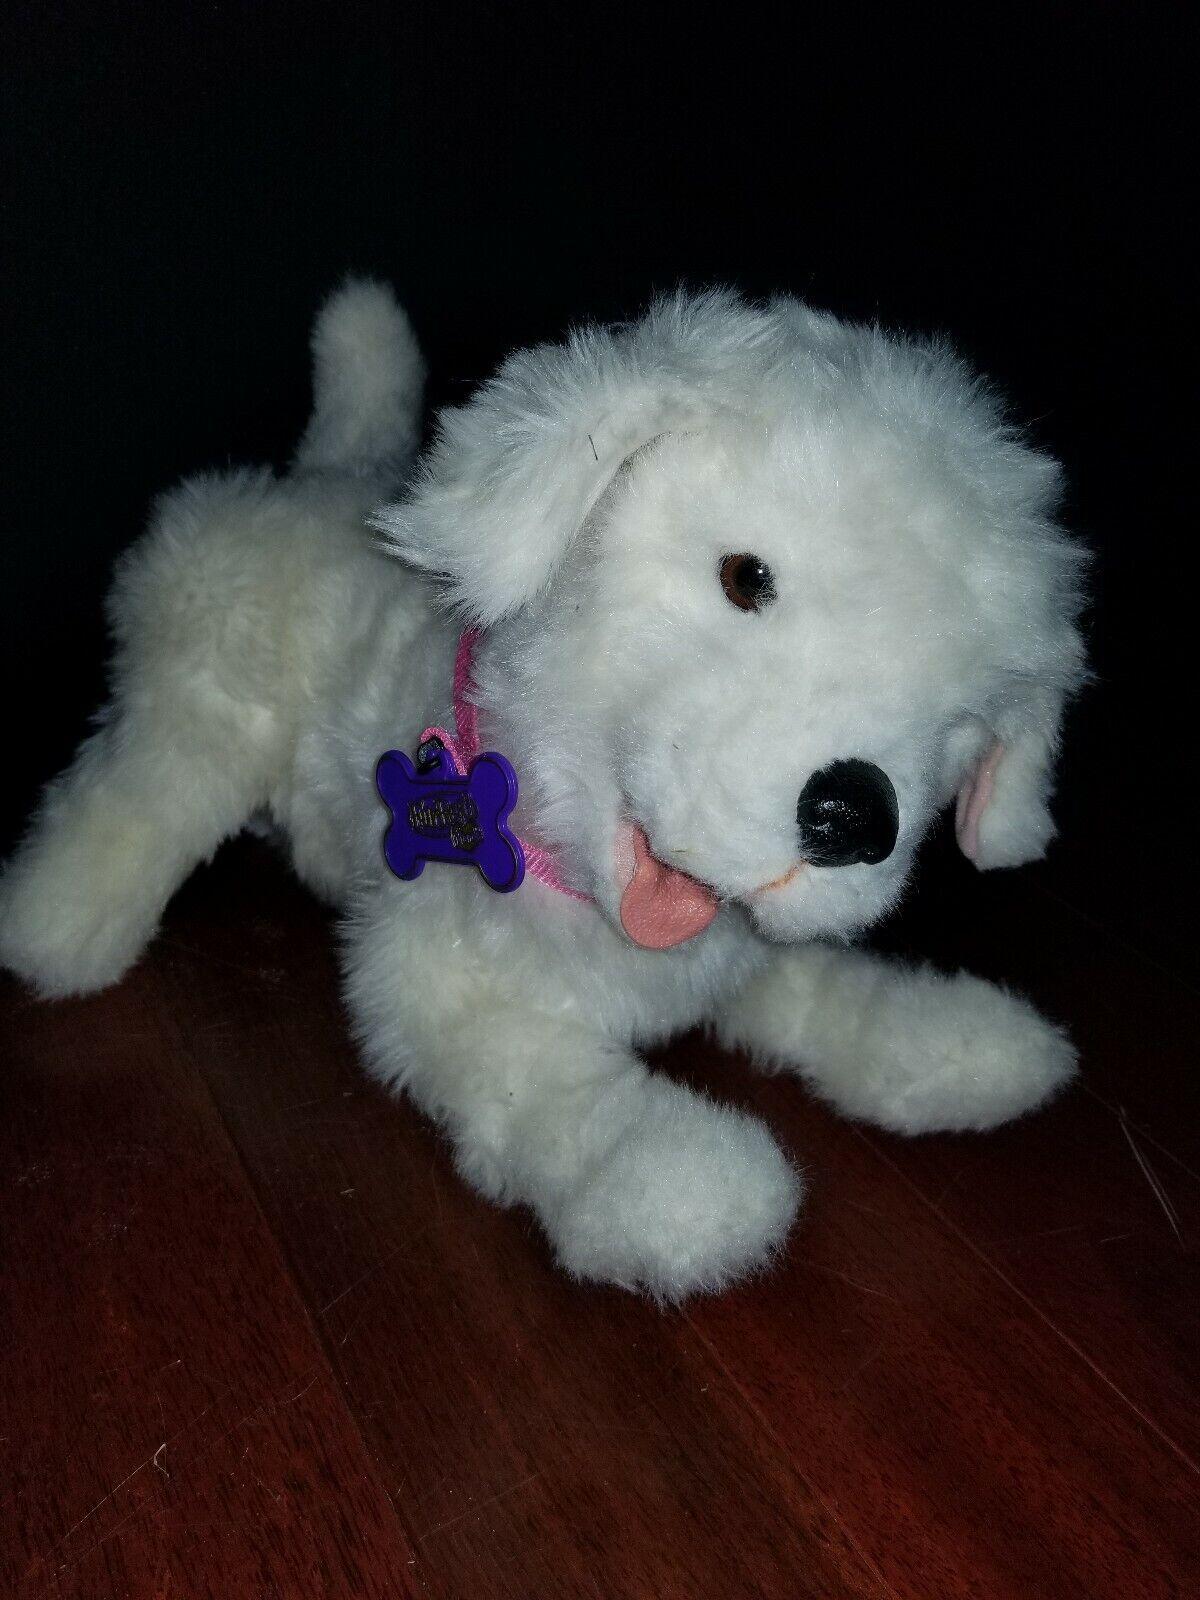 Hasbro Furreal Friends Pet Walkin Snuggimals Snug A Lopsy Puppy Dog 98640 For Sale Online Ebay